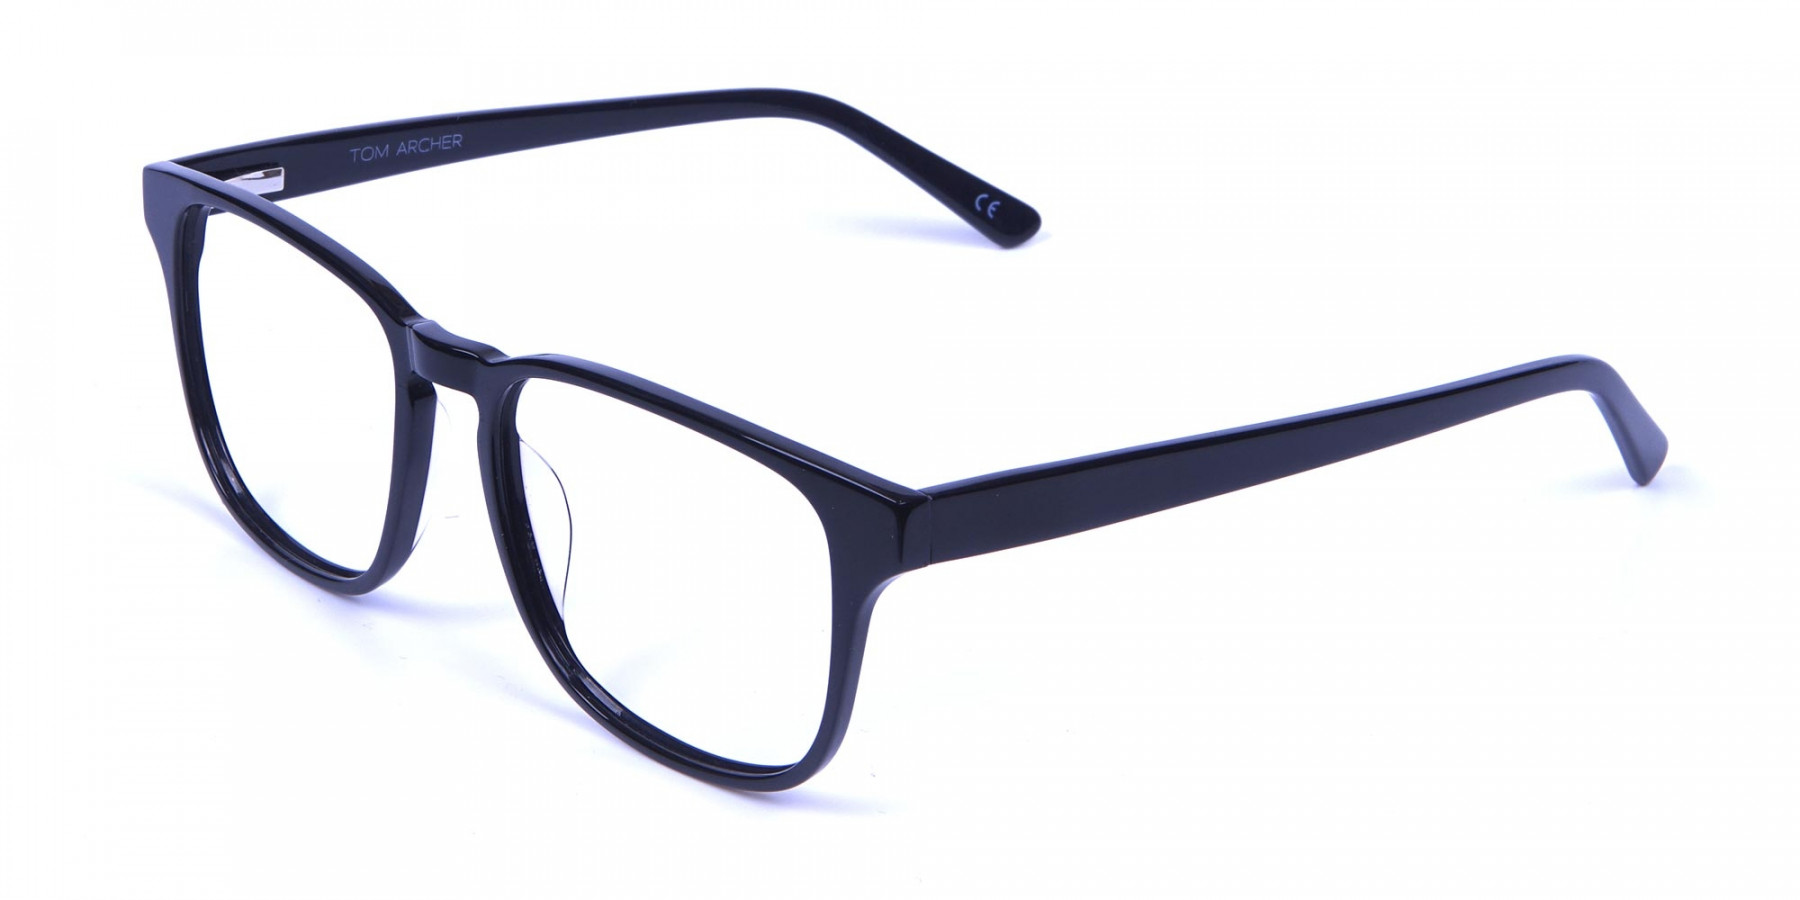 Stylish Black Rectangular Frames